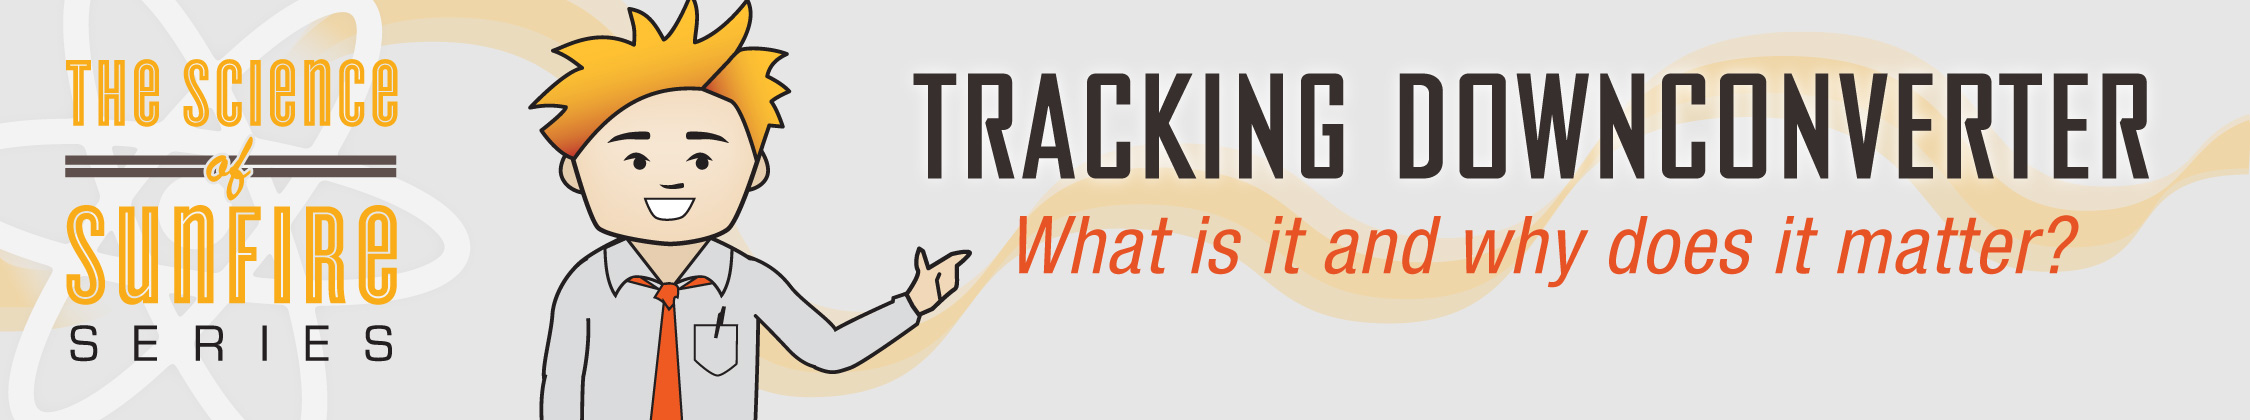 Tracking Downconverter